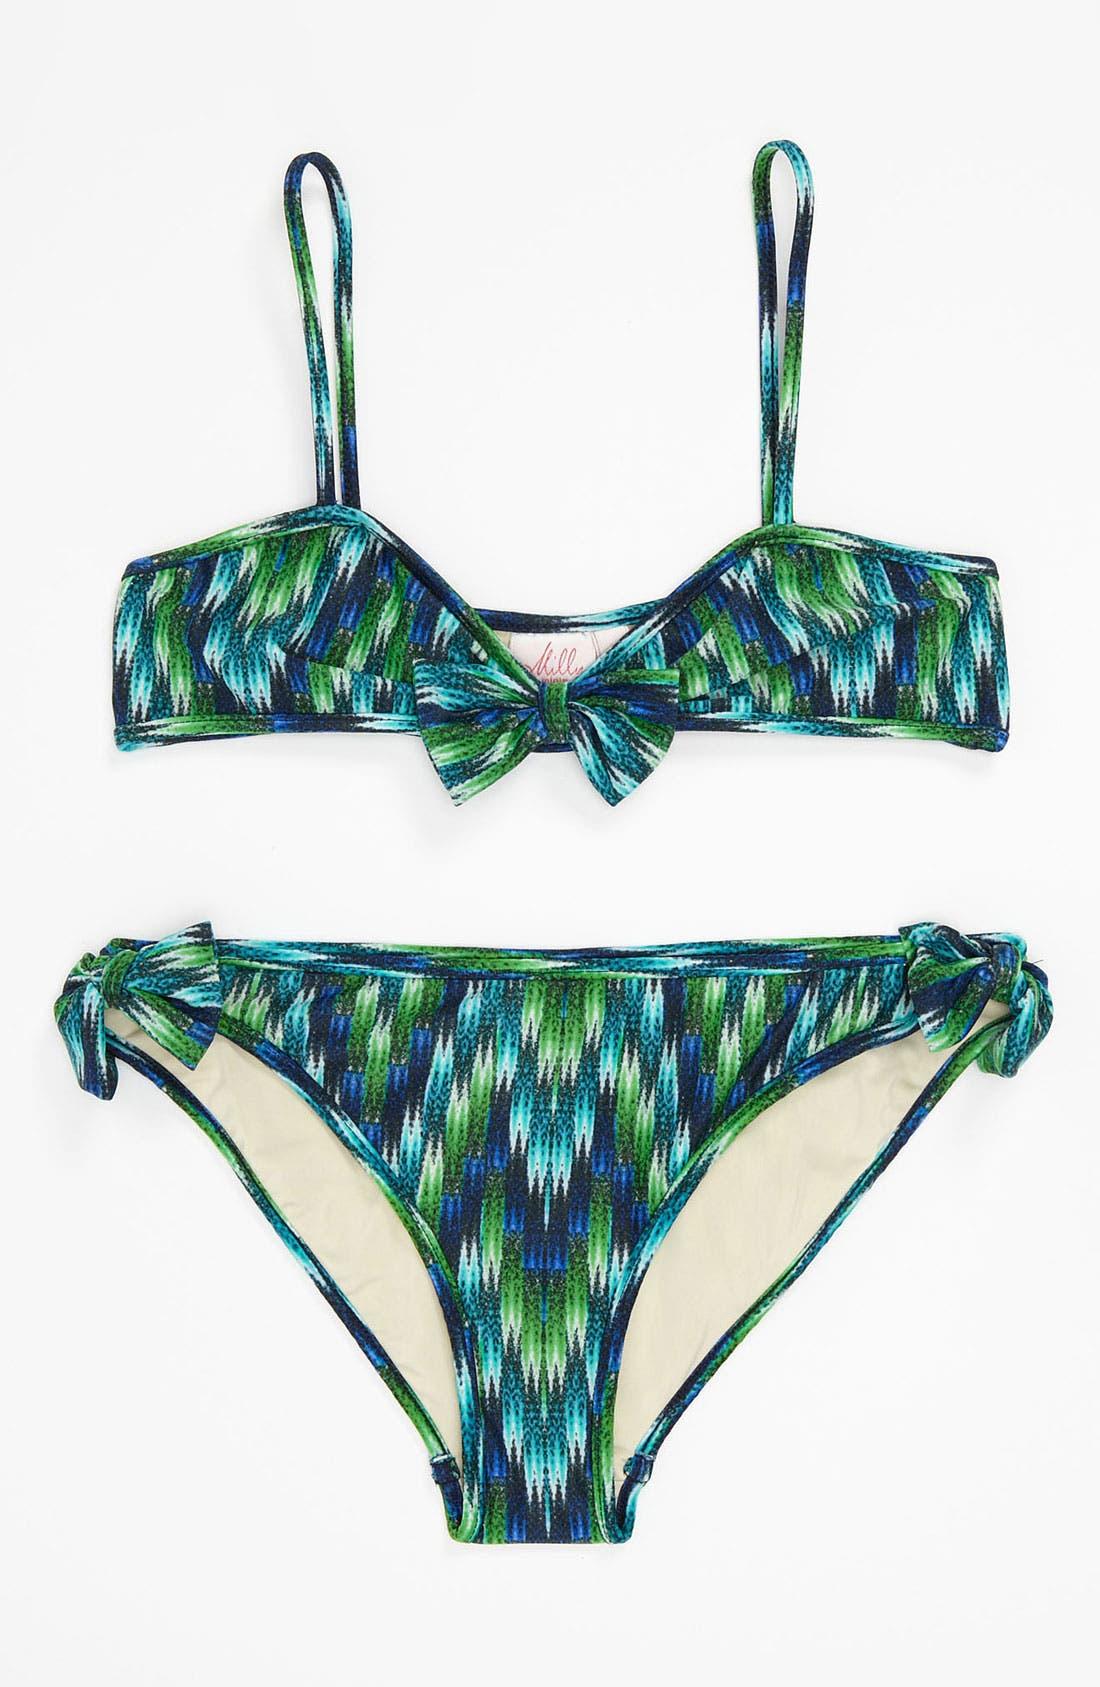 Alternate Image 1 Selected - Milly Minis 'Sagaponack' Two Piece Bikini Swimsuit (Big Girls)